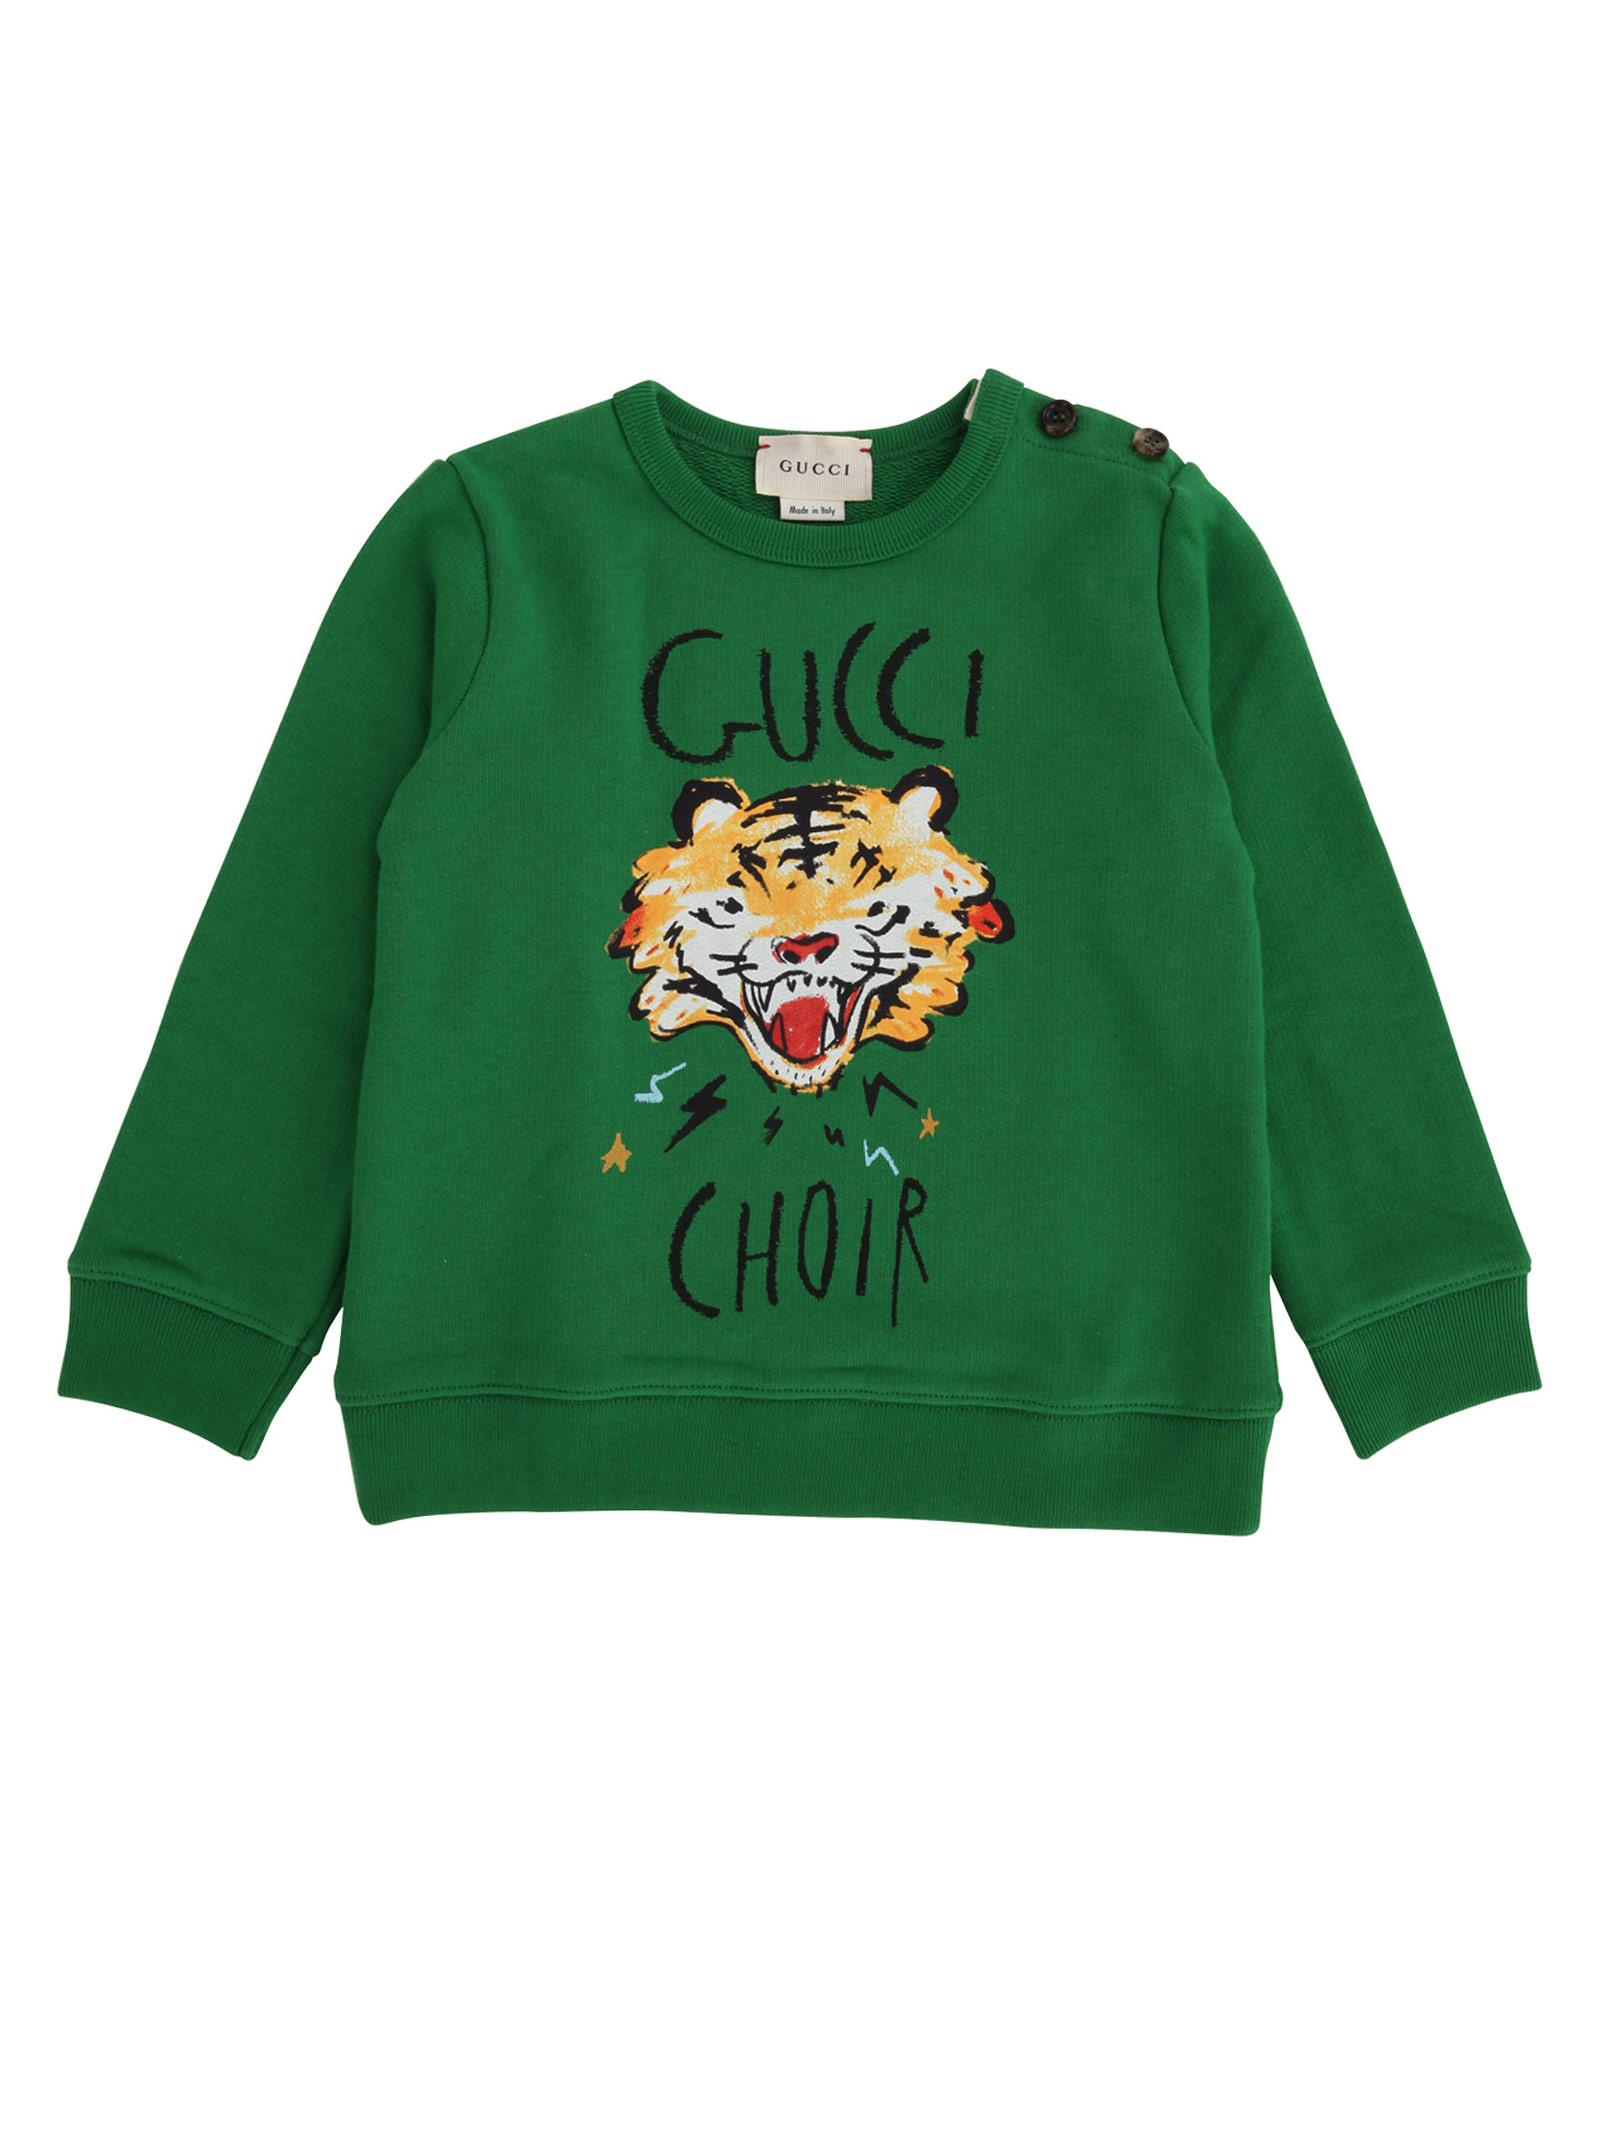 3a1c278c Gucci Junior Sweatshirt - Gucci Junior - Michele Franzese Moda